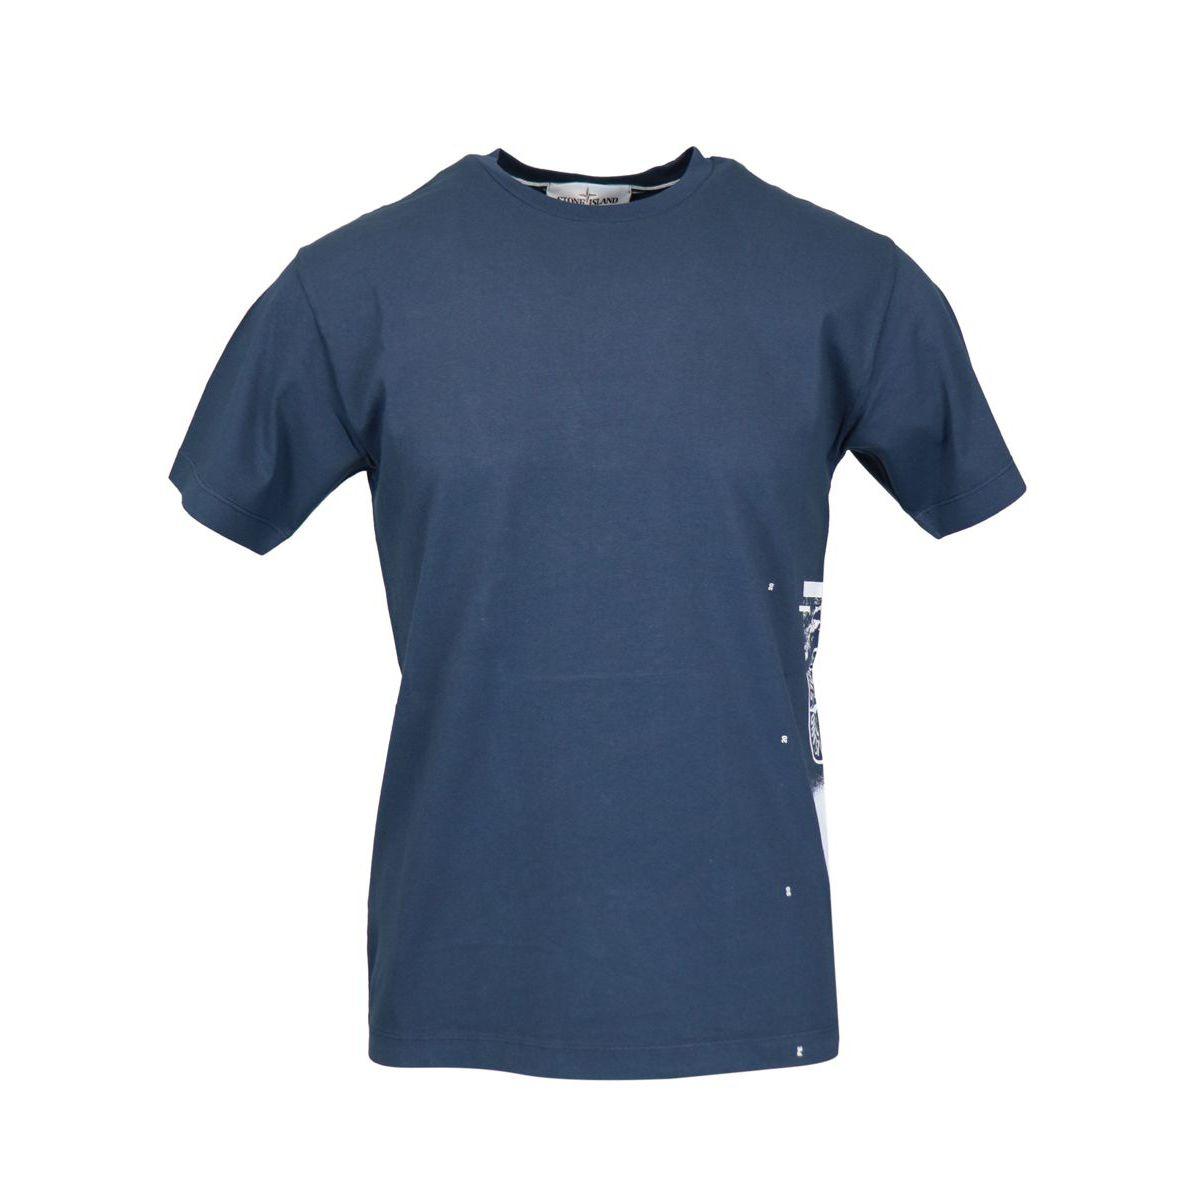 Cotton t-shirt with side logo print Marine blue Stone Island